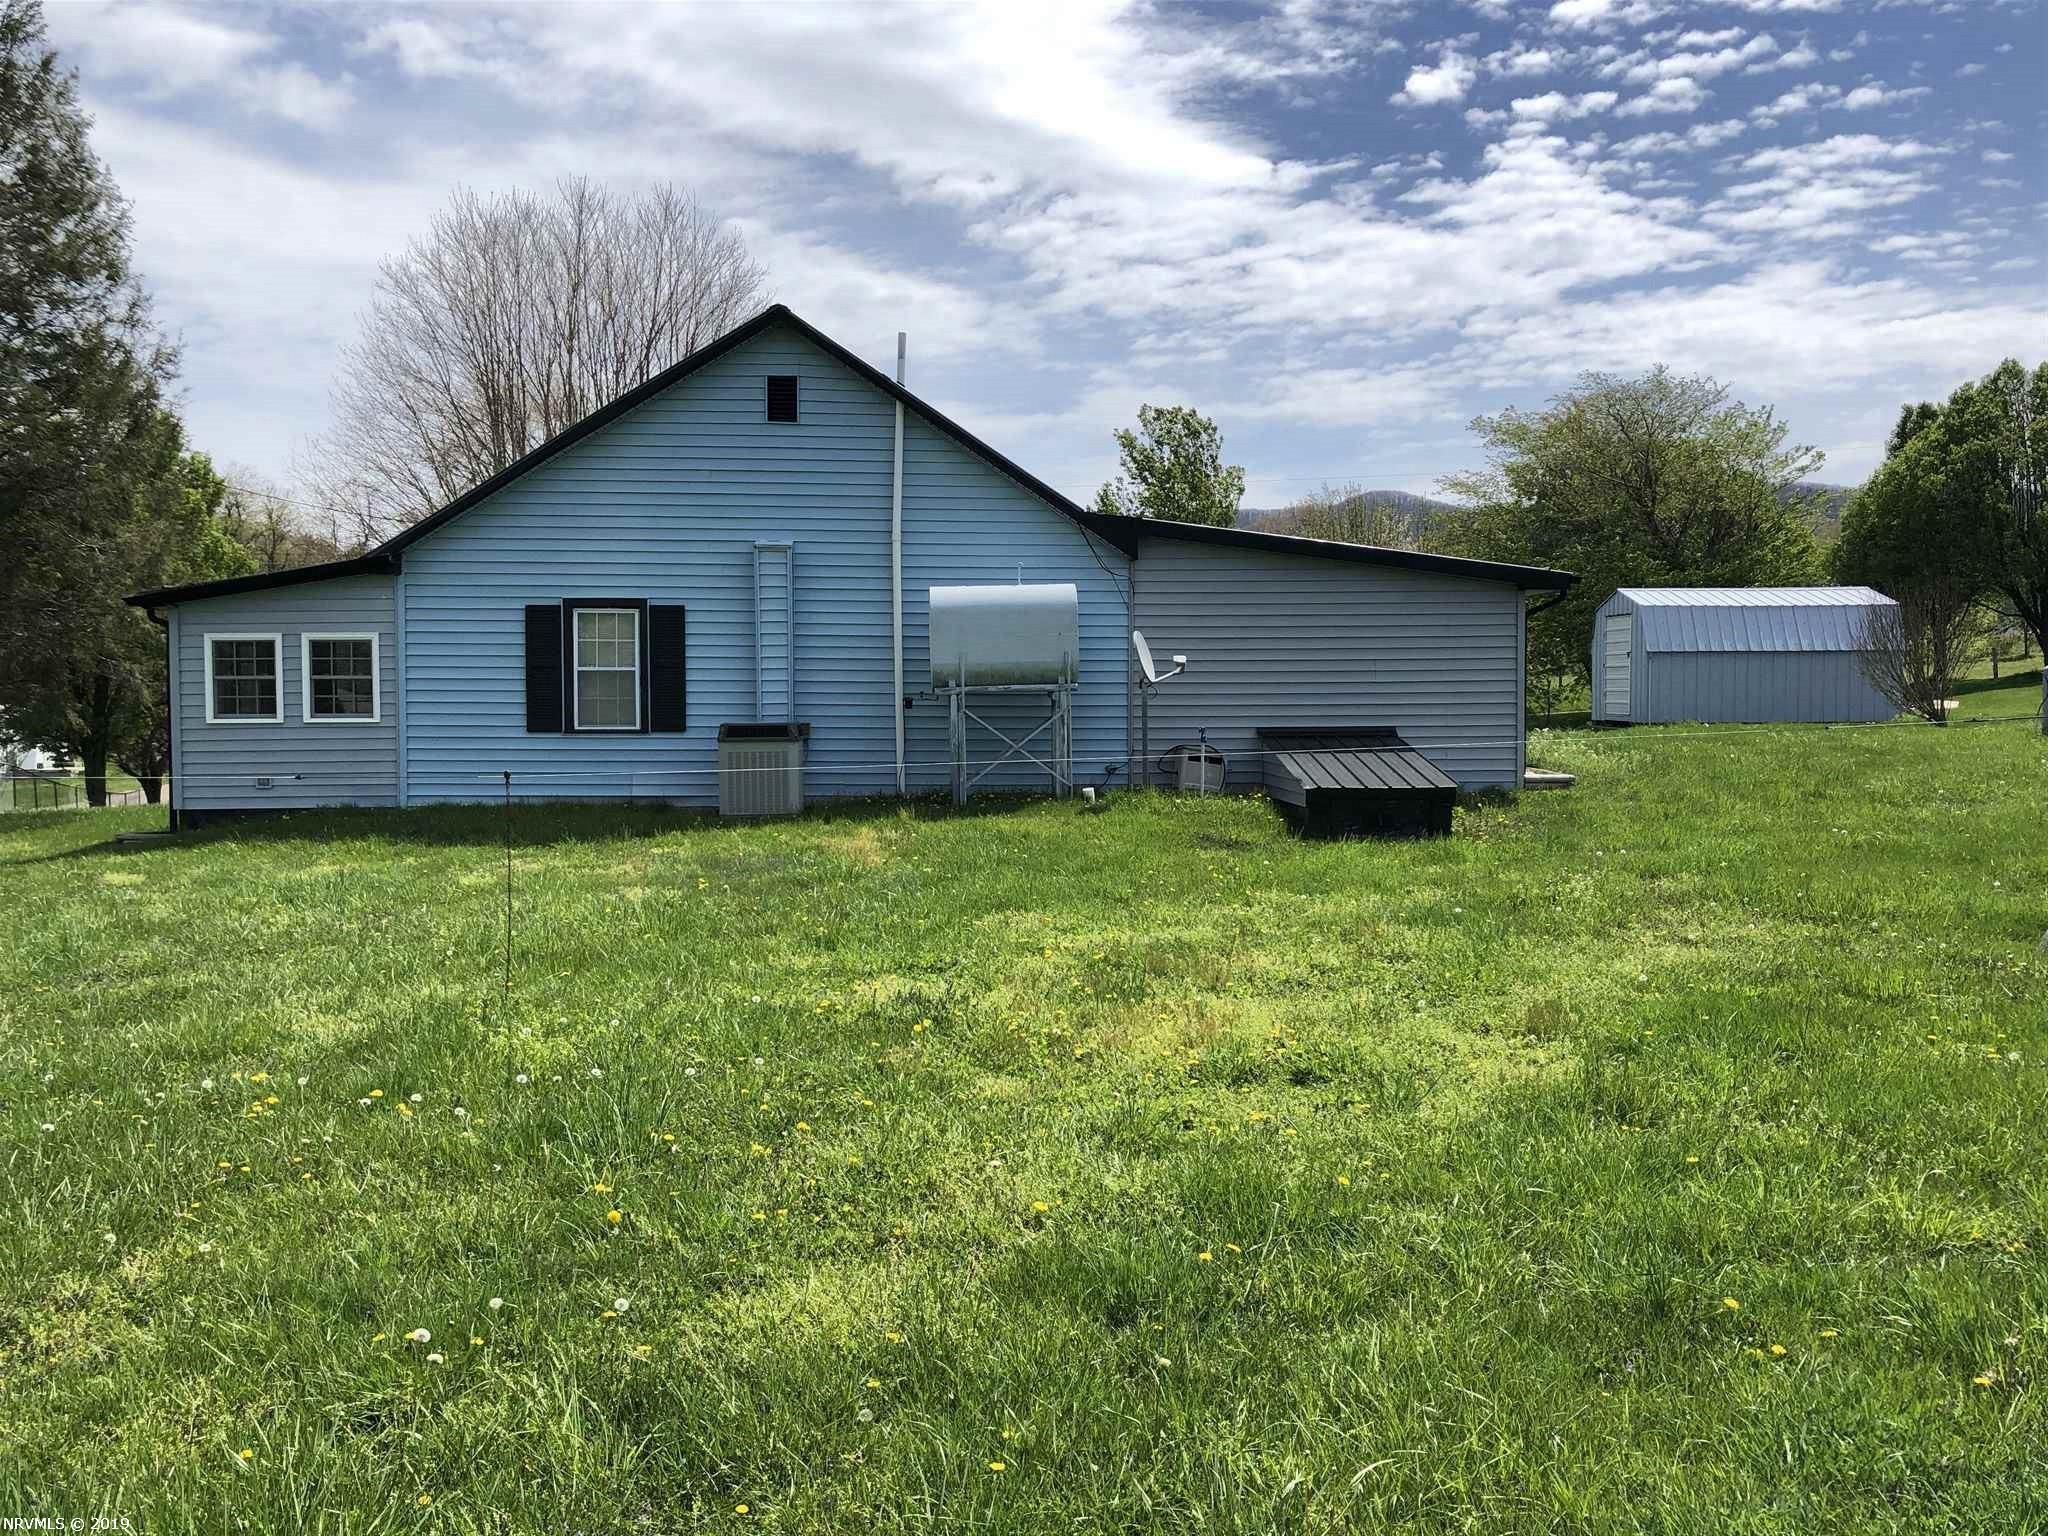 532 Barton, Sugar Grove, VA, 24375